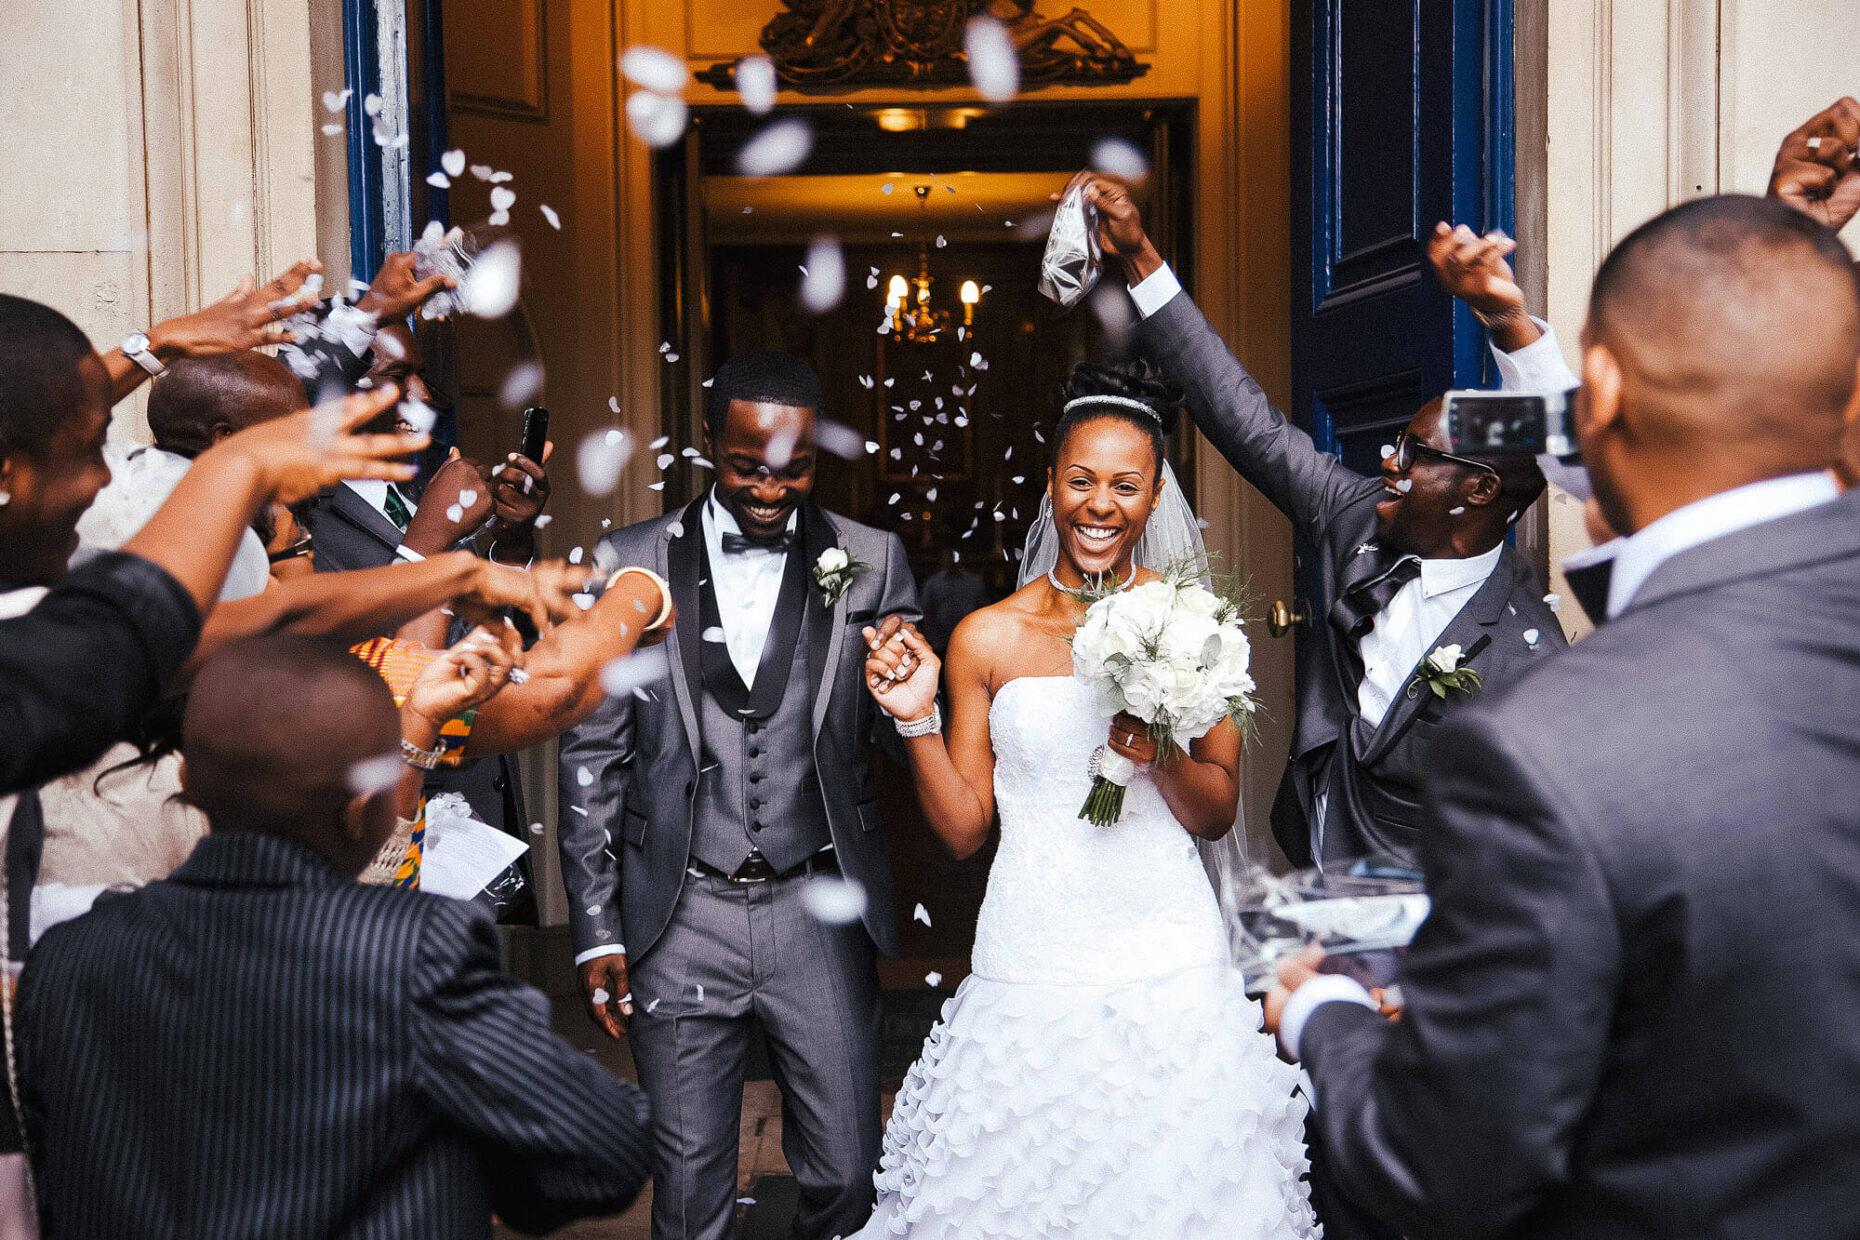 multicultural wedding couple in confetti